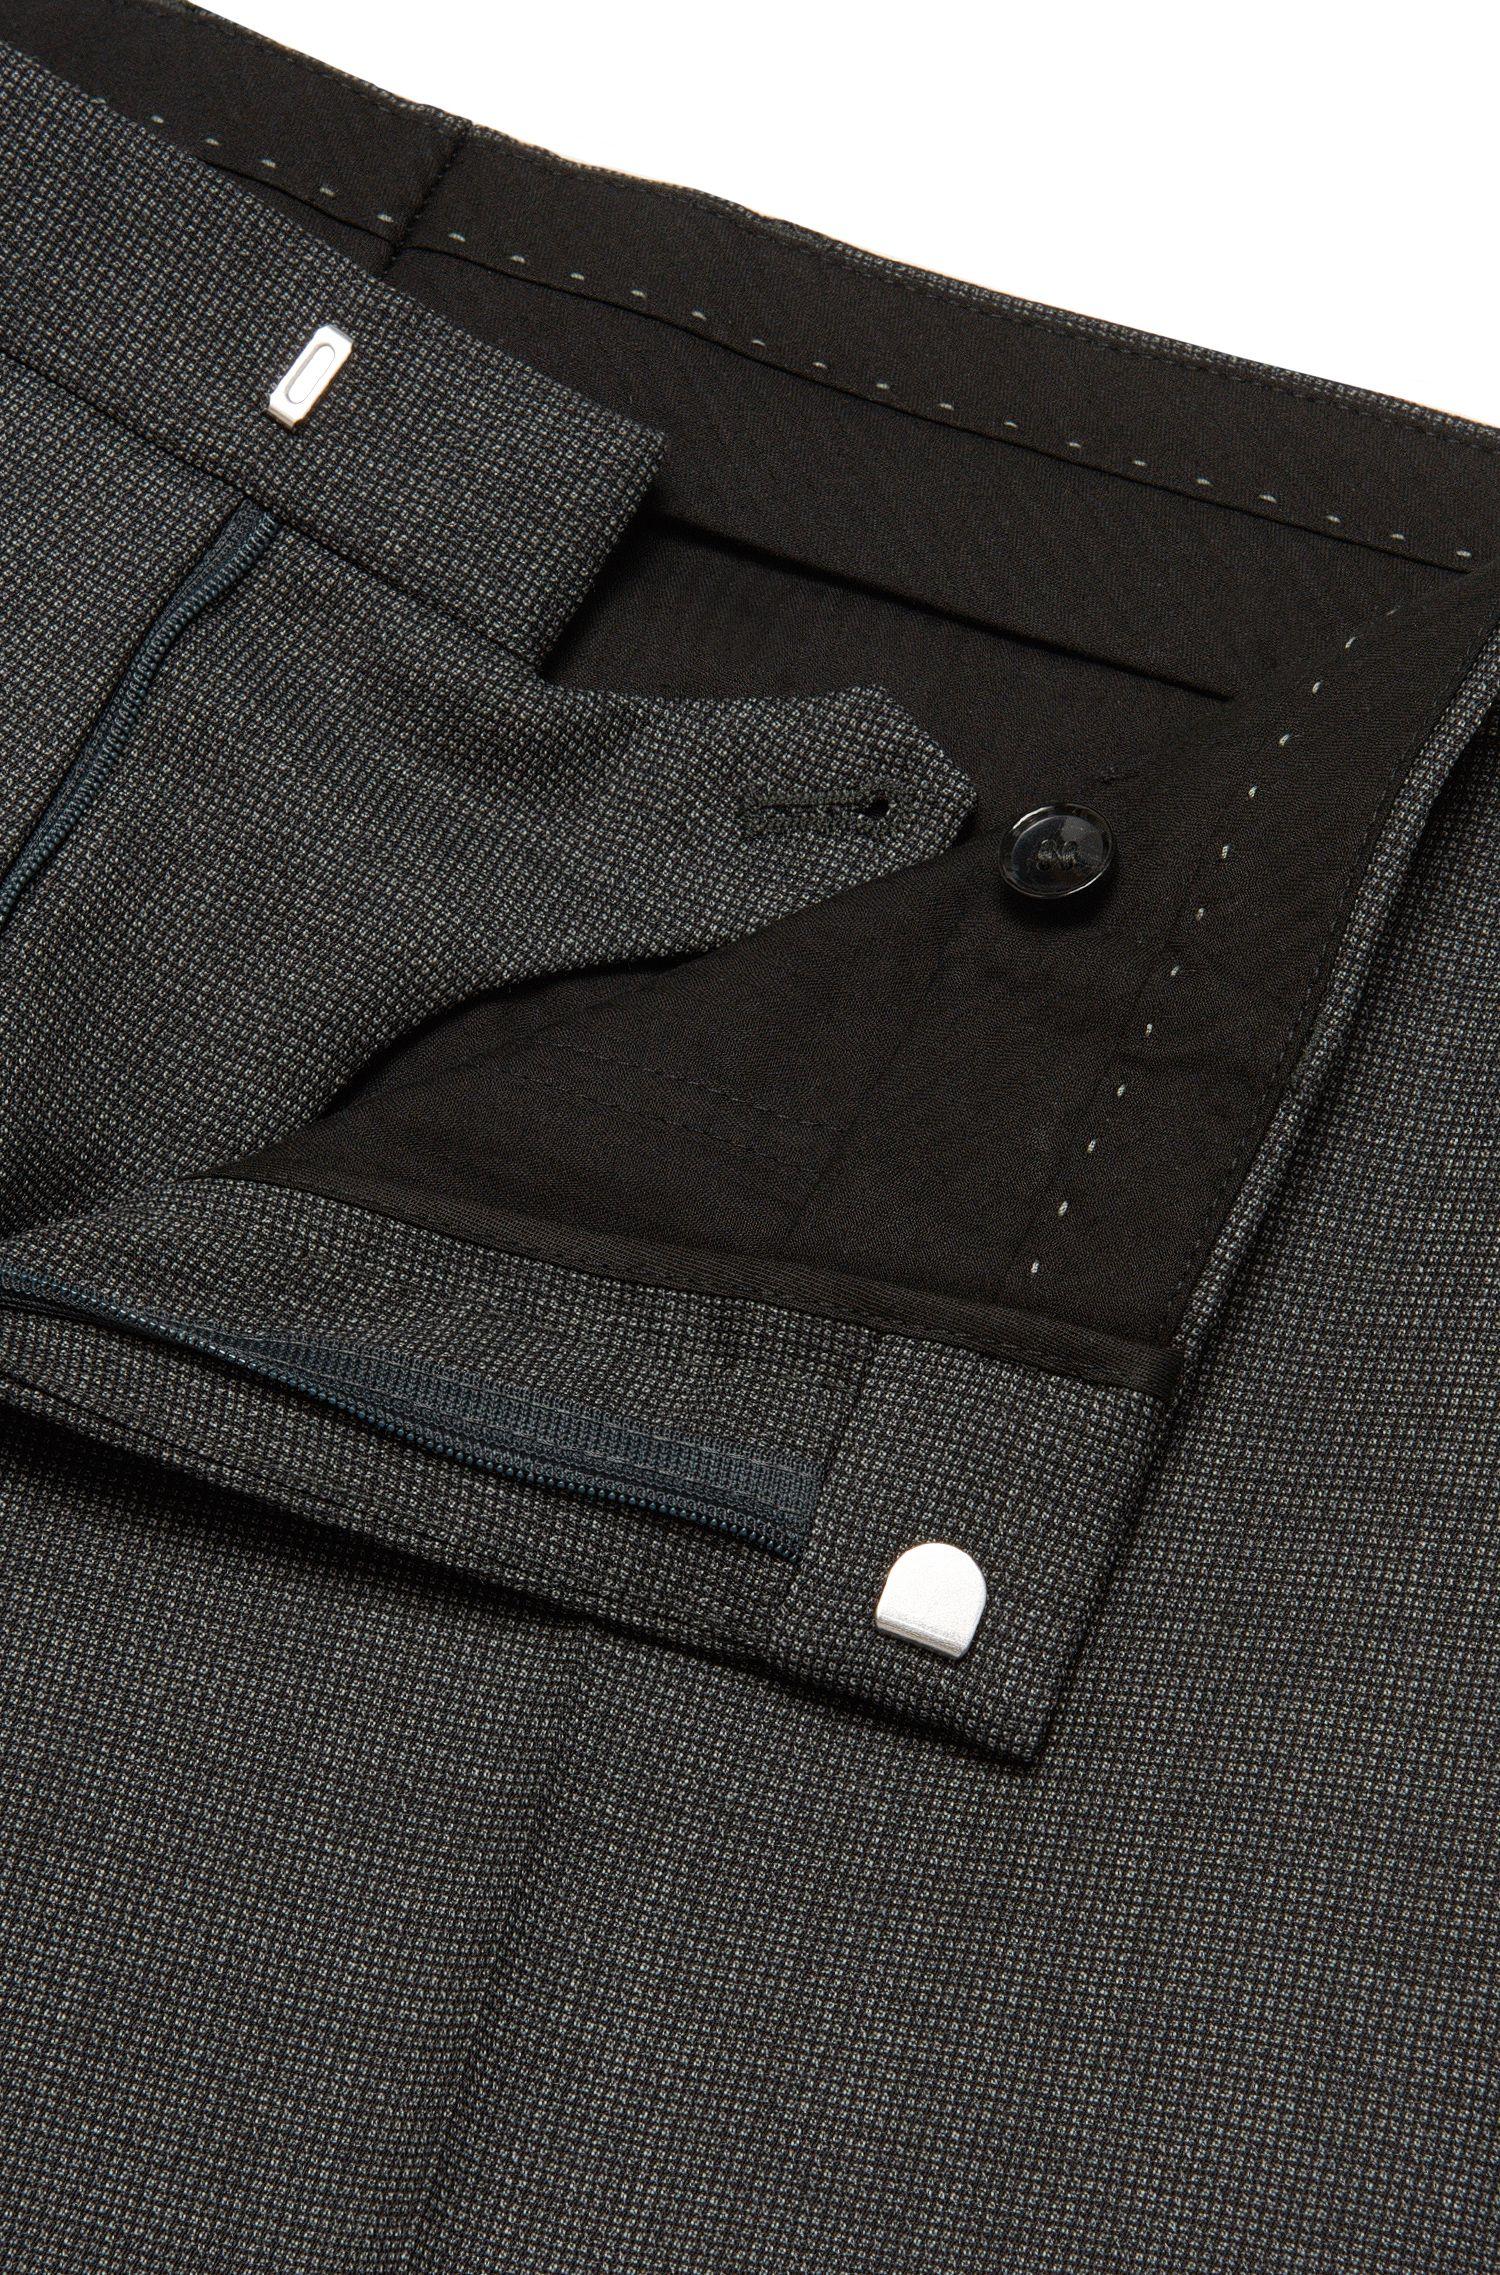 Gemusterte Slim-Fit Tailored Hose aus Schurwolle: 'T-Gleeve1'